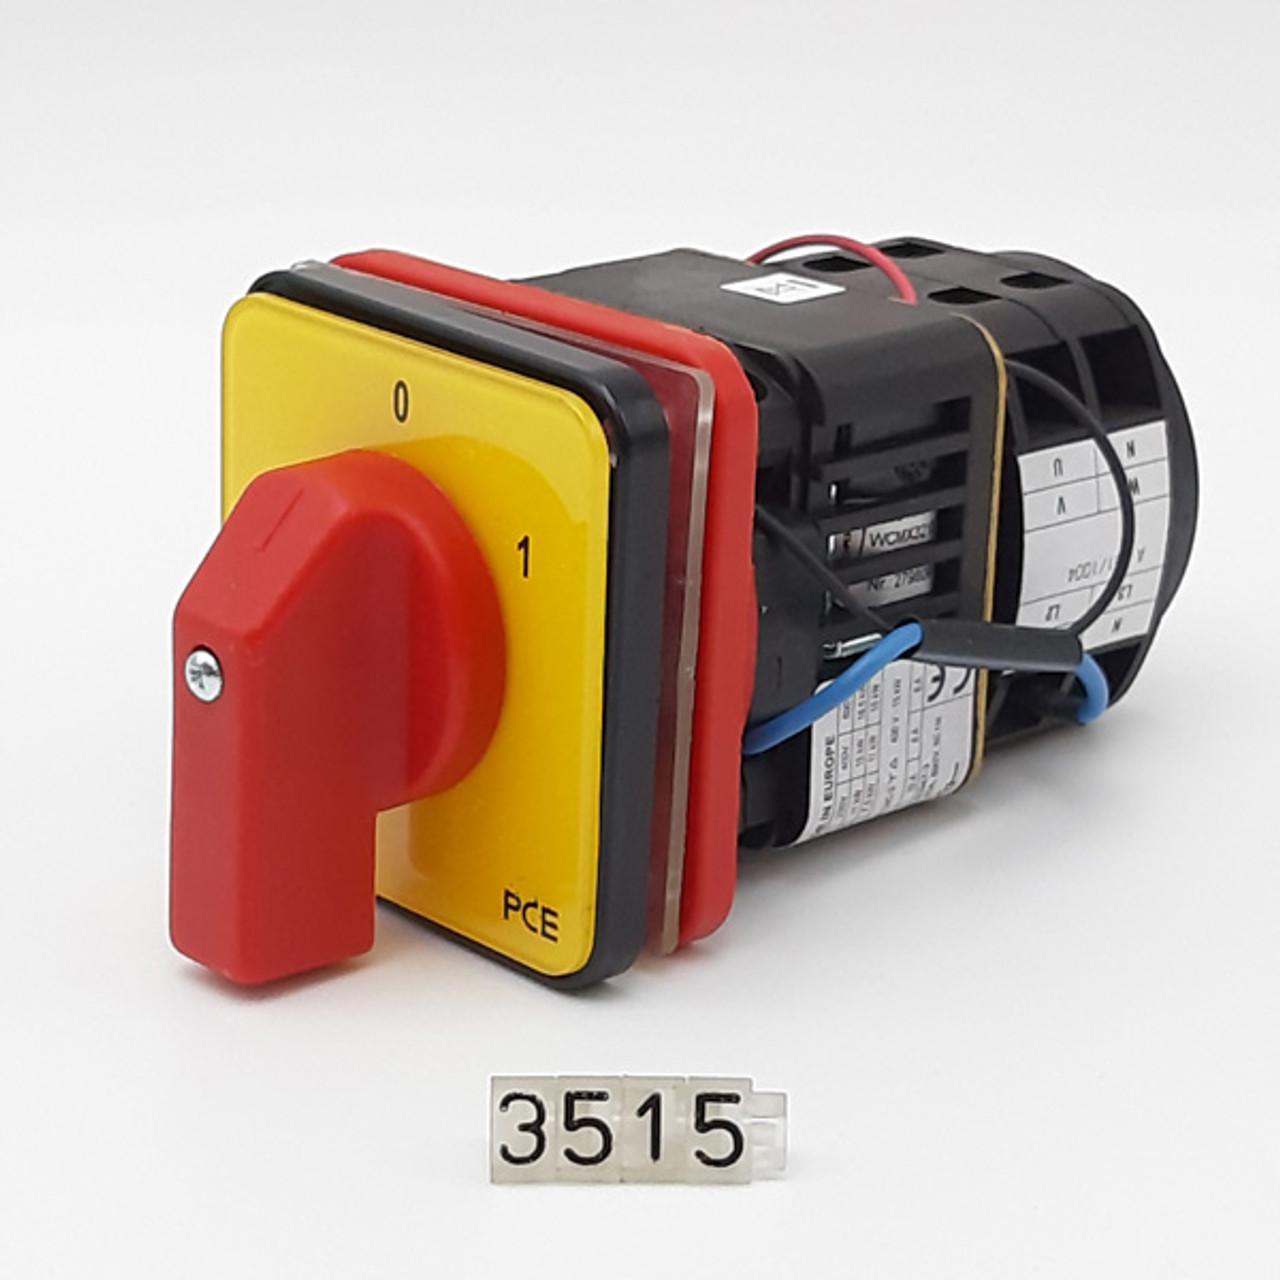 Talsa K-682 - K30e - SWITCH, 3-PHASE, DISCONNECTOR, 25A 208/220V 60HZ